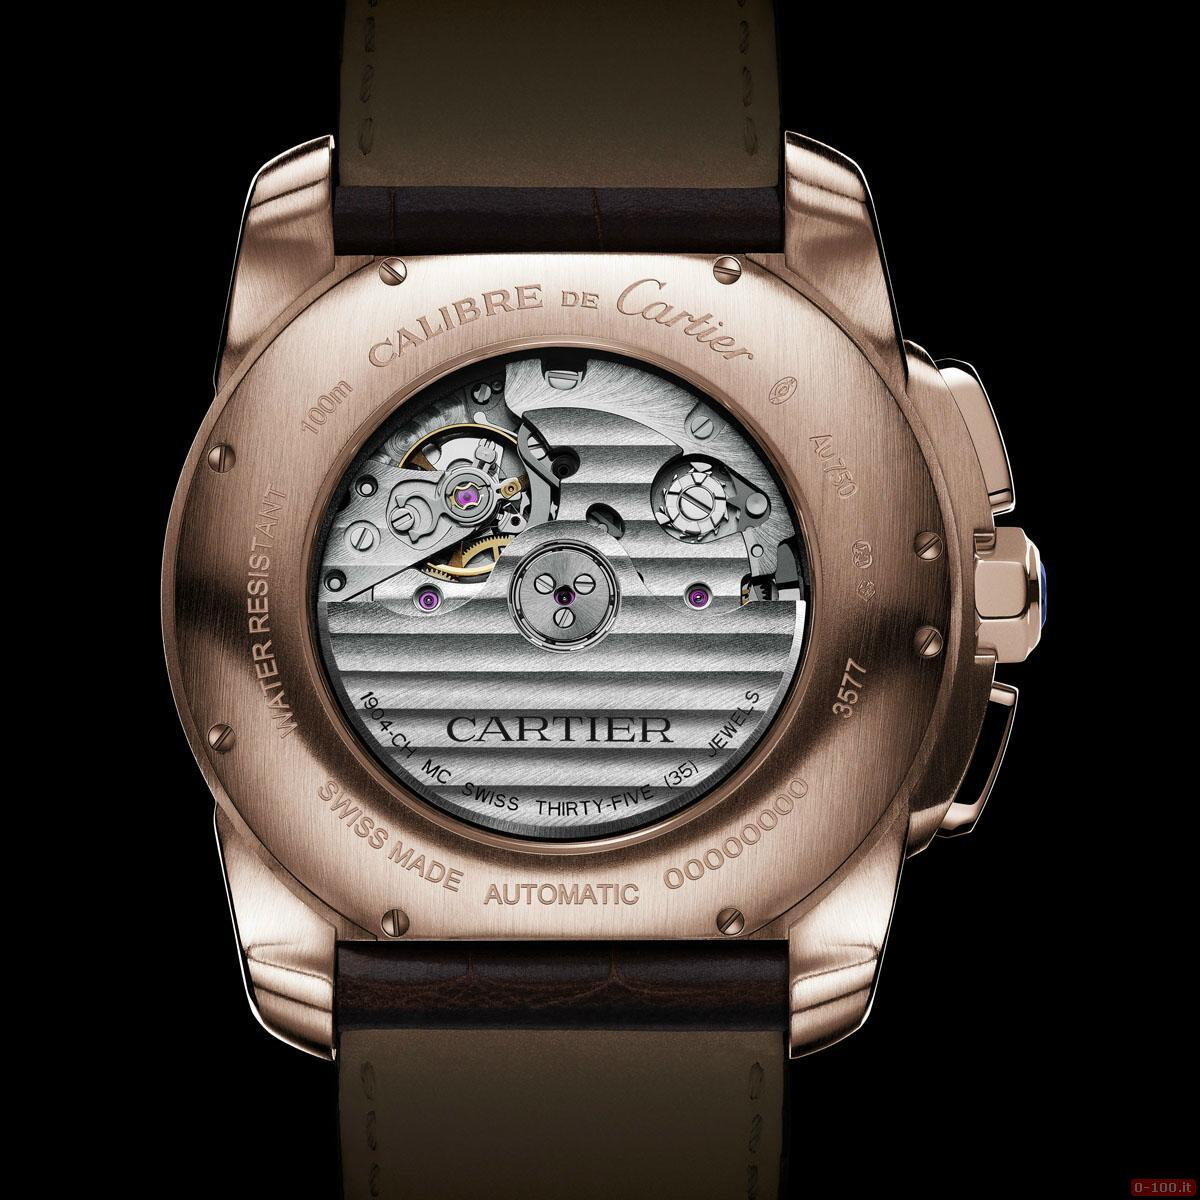 Cartier Calibre Chronograph Watch _0-1004